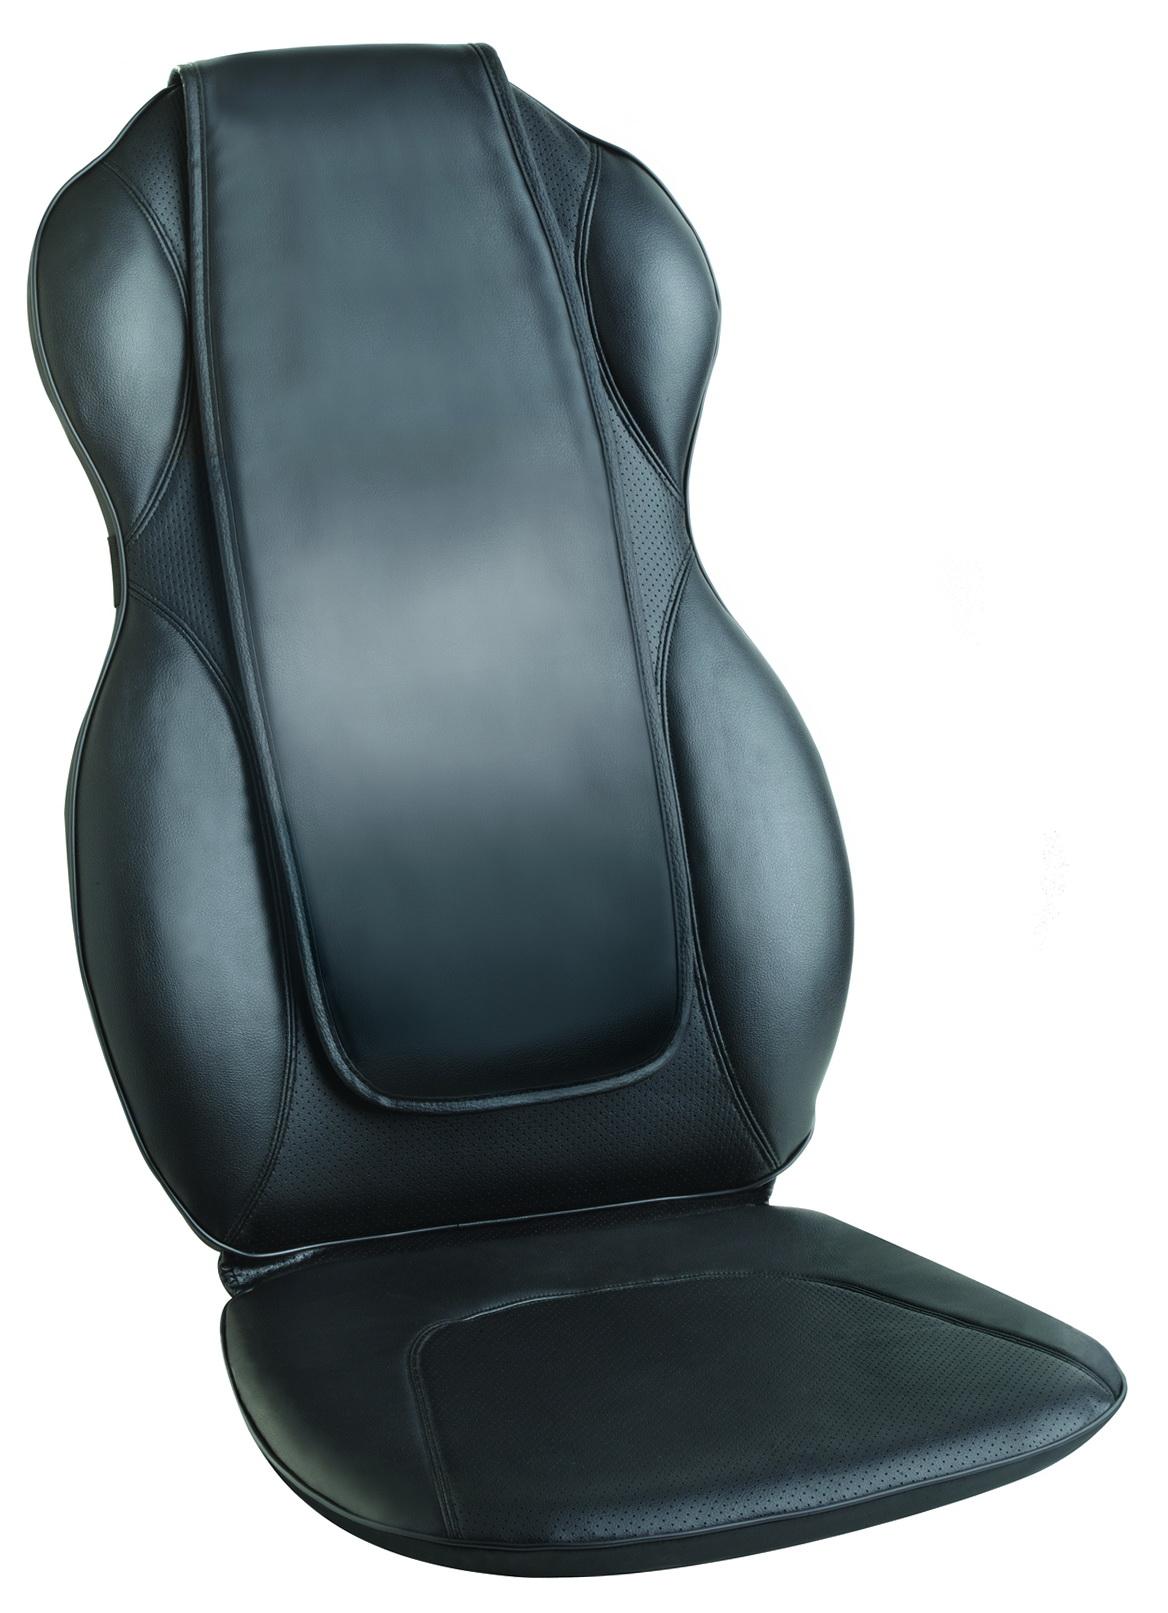 Homedics Quad Shiatsu Massage Cushion With Heat